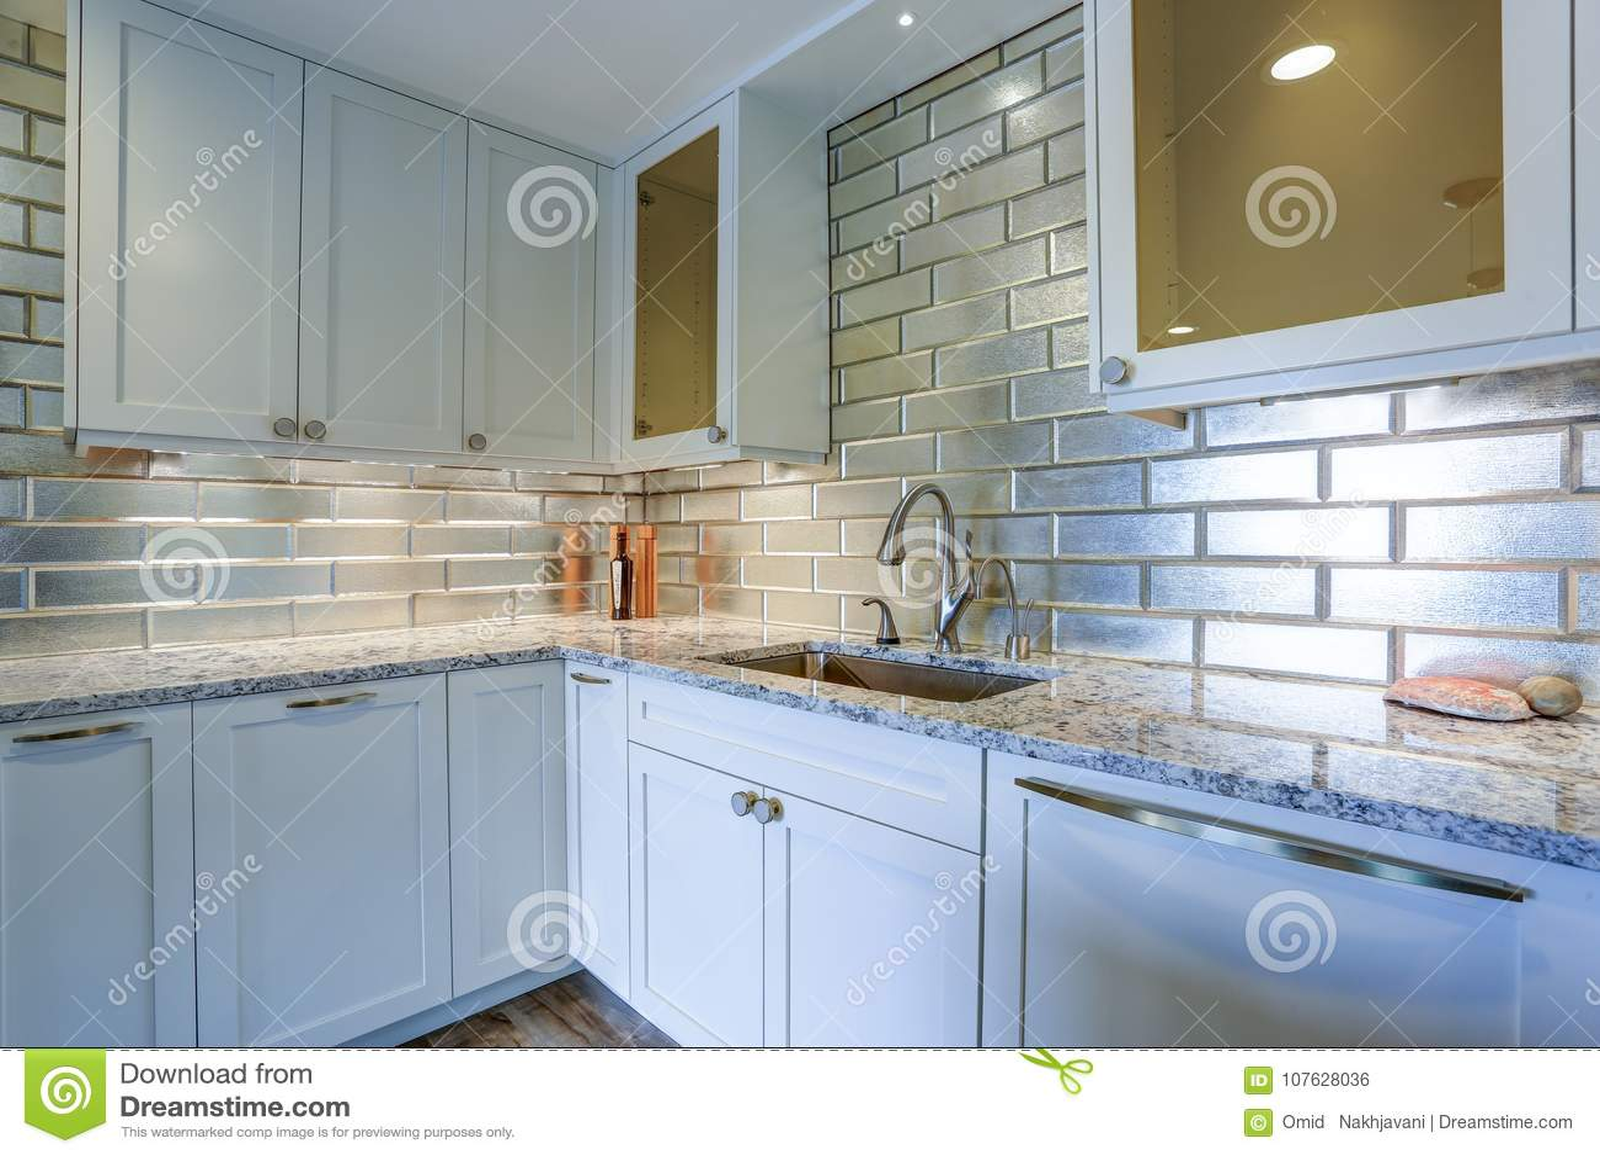 Modern White Kitchen Design With Silver Backsplash Stock Photo ...